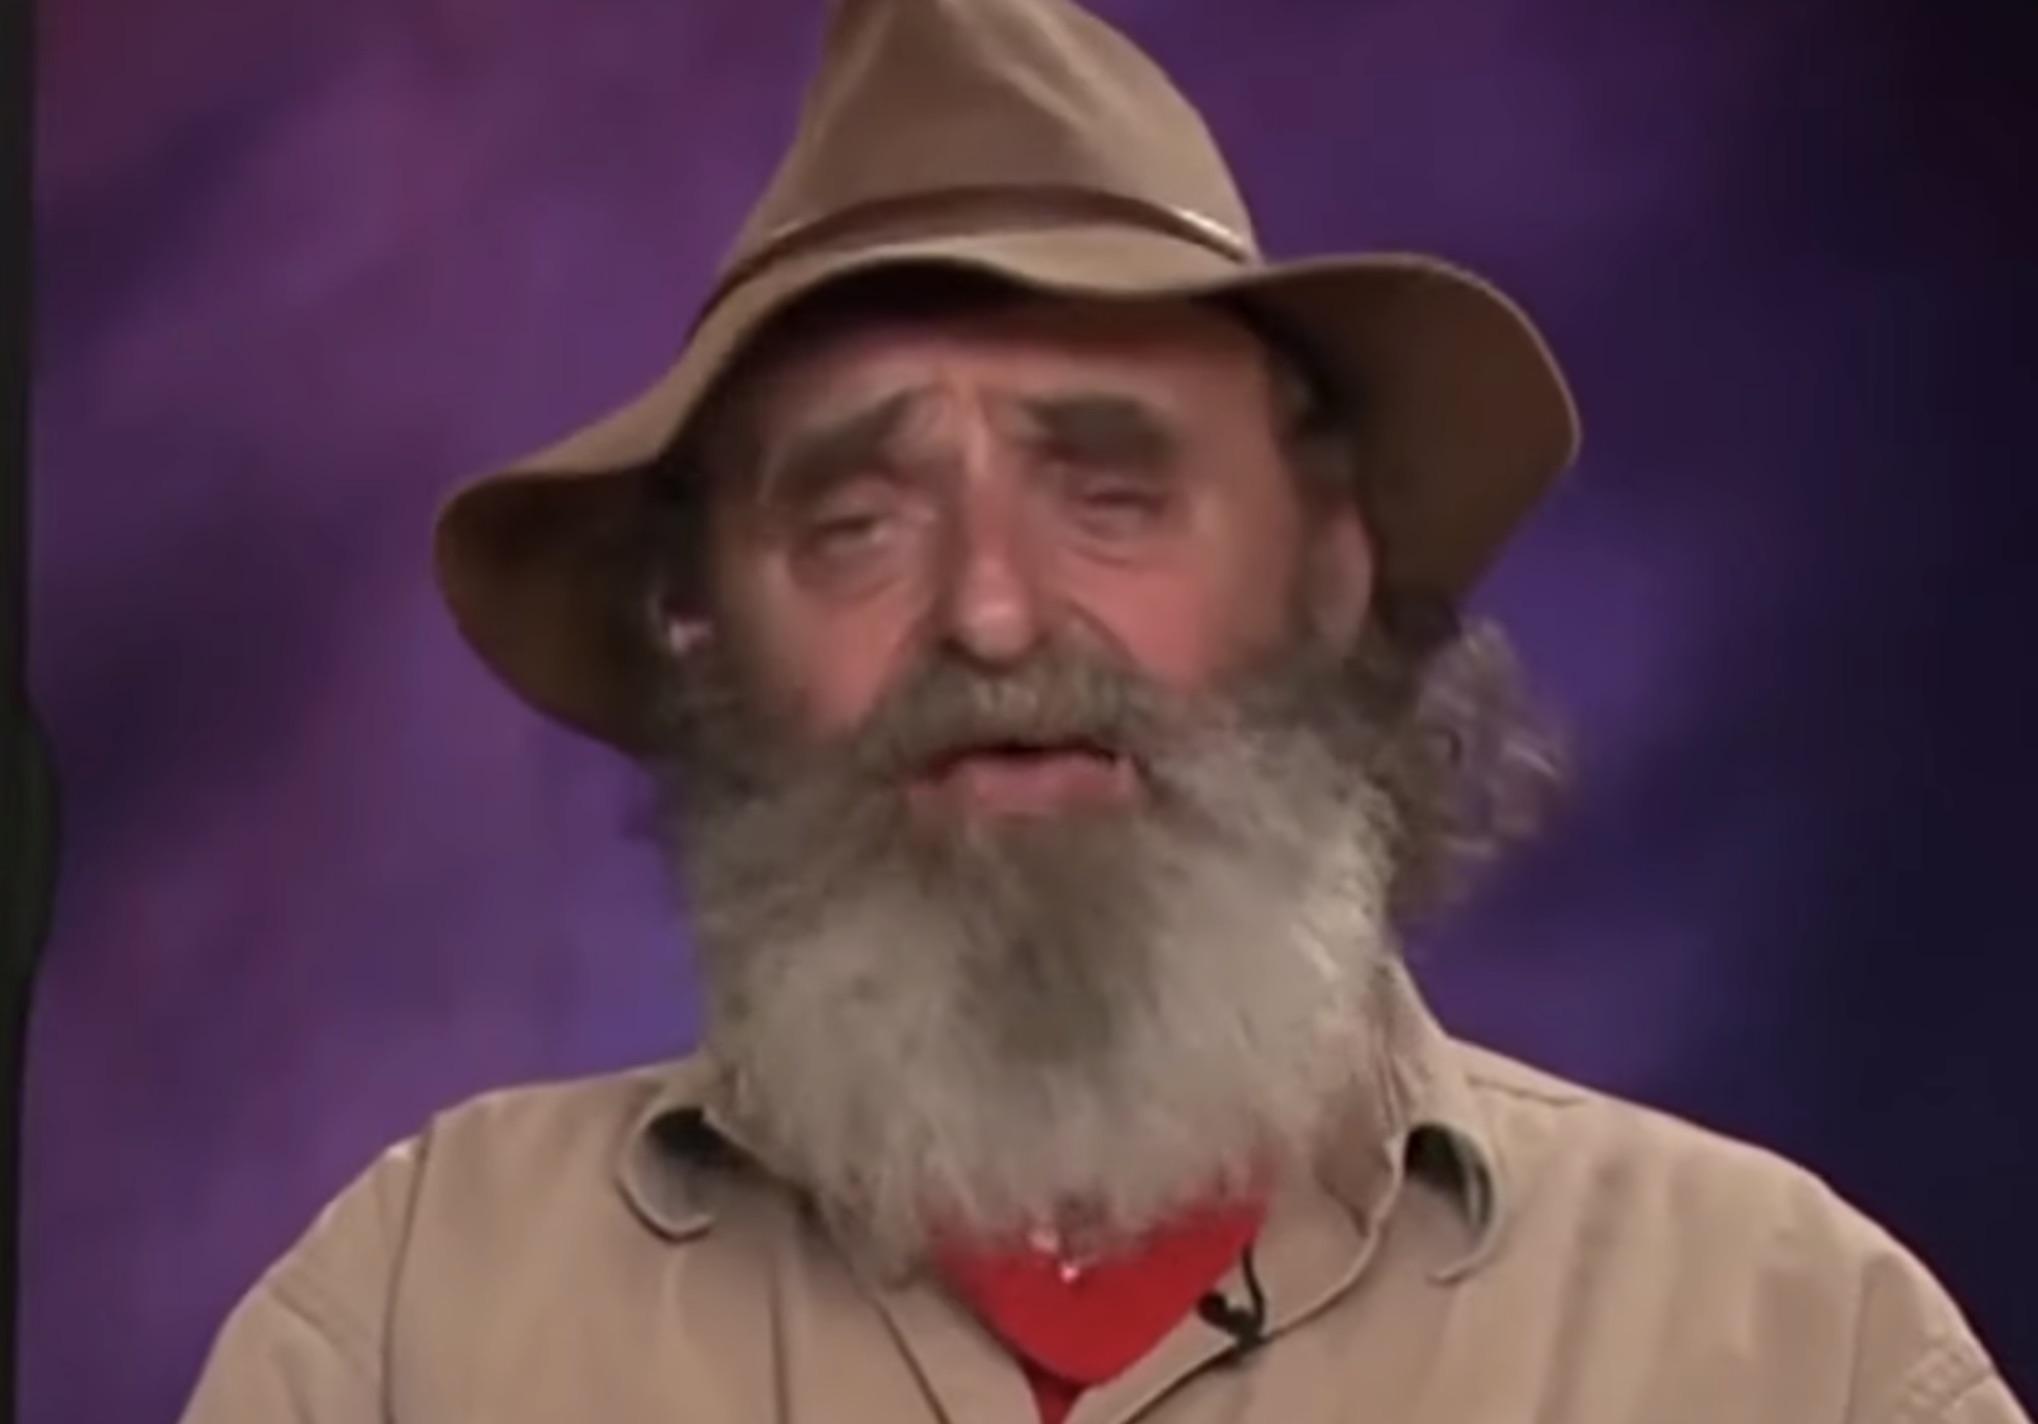 John Trapper Tice, Mountain Monsters-https://www.youtube.com/watch?v=oFzDdQ_LAhc&fbclid=IwAR2bks5z0JVJ4D3m4IOERmVUsfdypfZyaC6cvOVSVOJyCmHDJgxZdyDD7GM